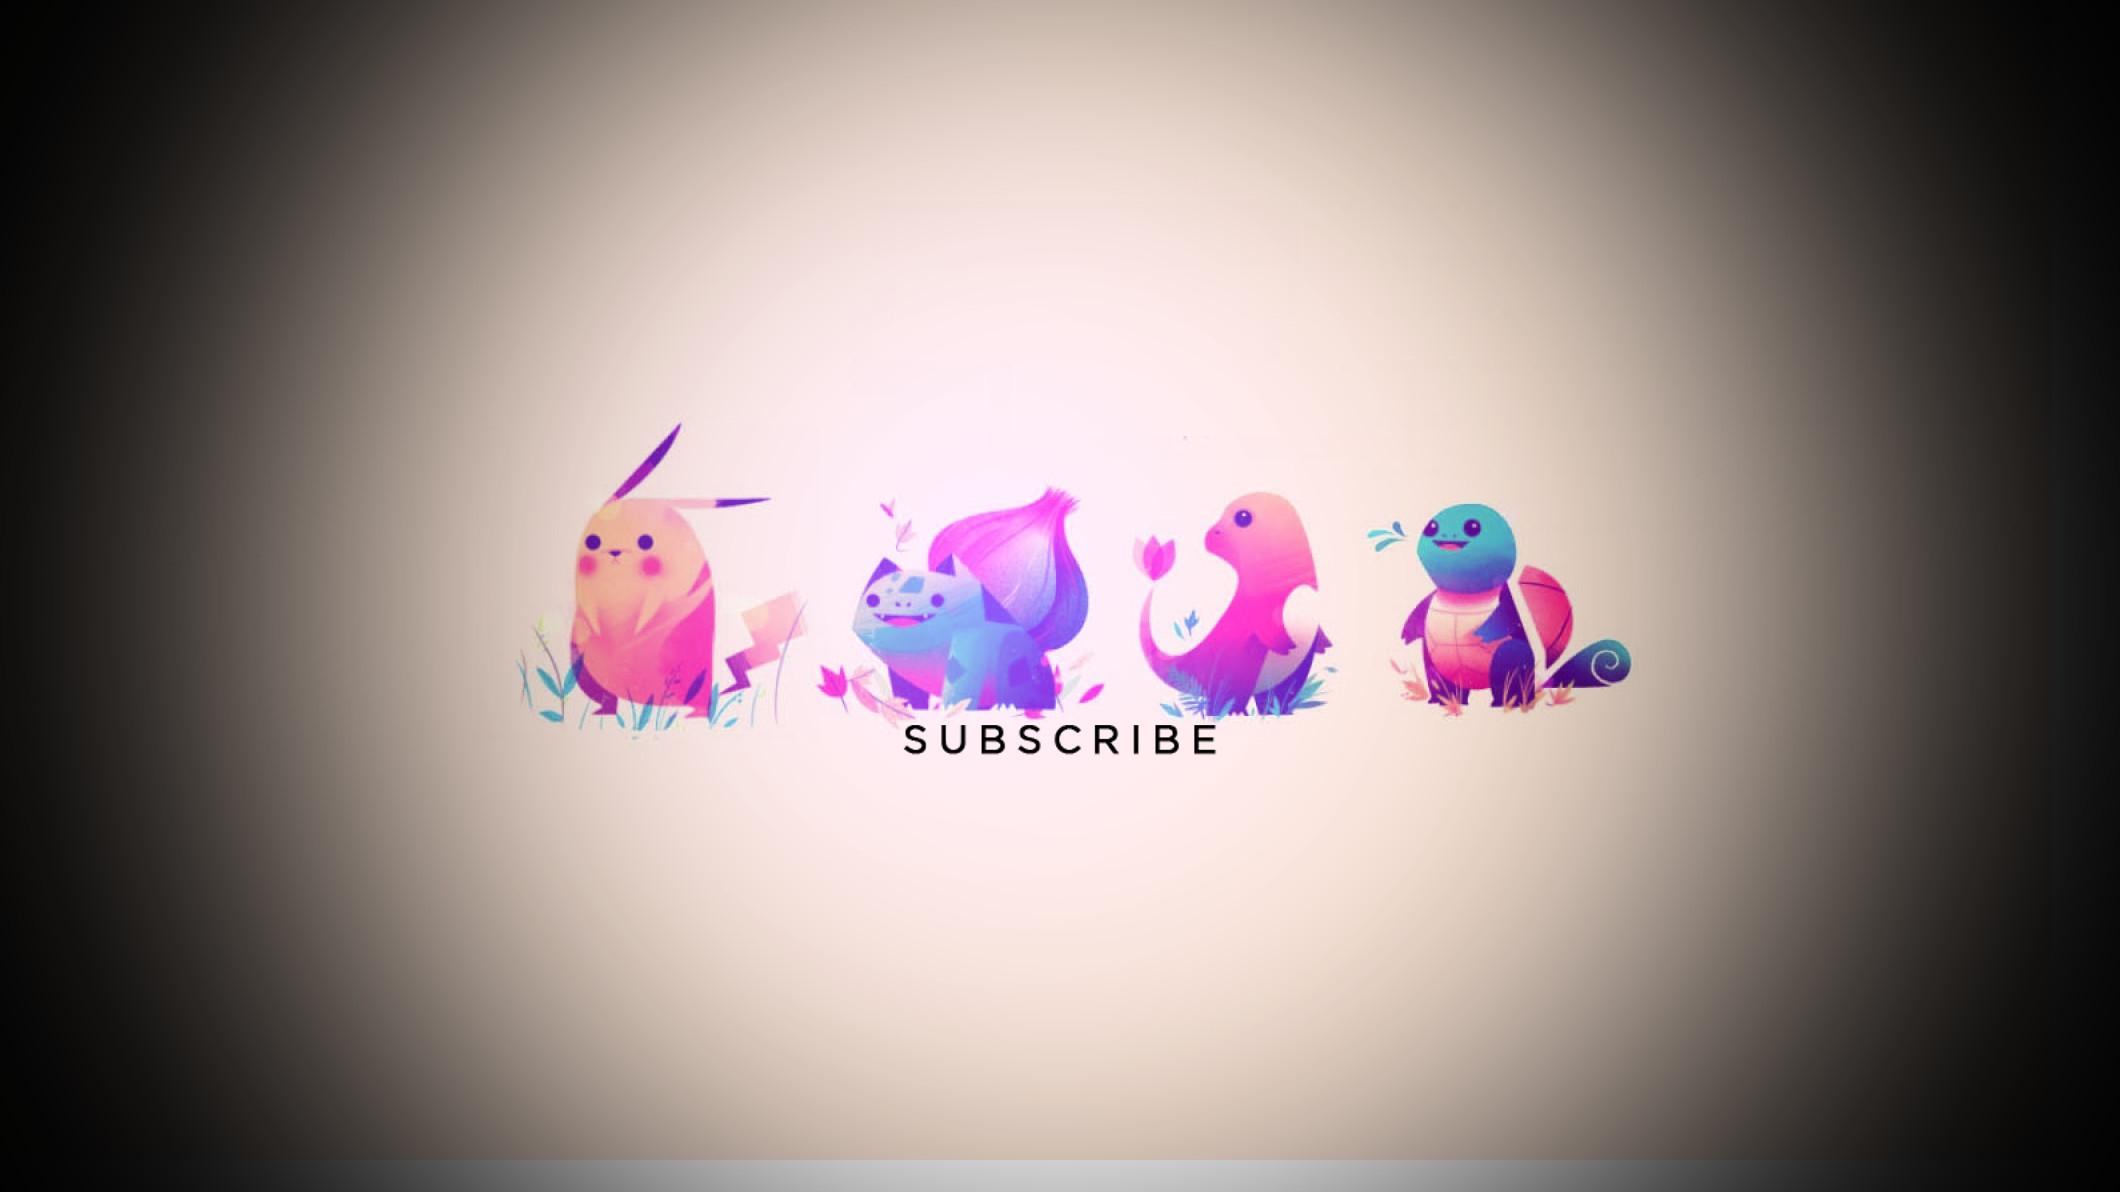 2048 1152 Youtube Channel Art Wallpaper Wallpapersafari Cute 2048x1152 Channel Art 2120x1192 Download Hd Wallpaper Wallpapertip